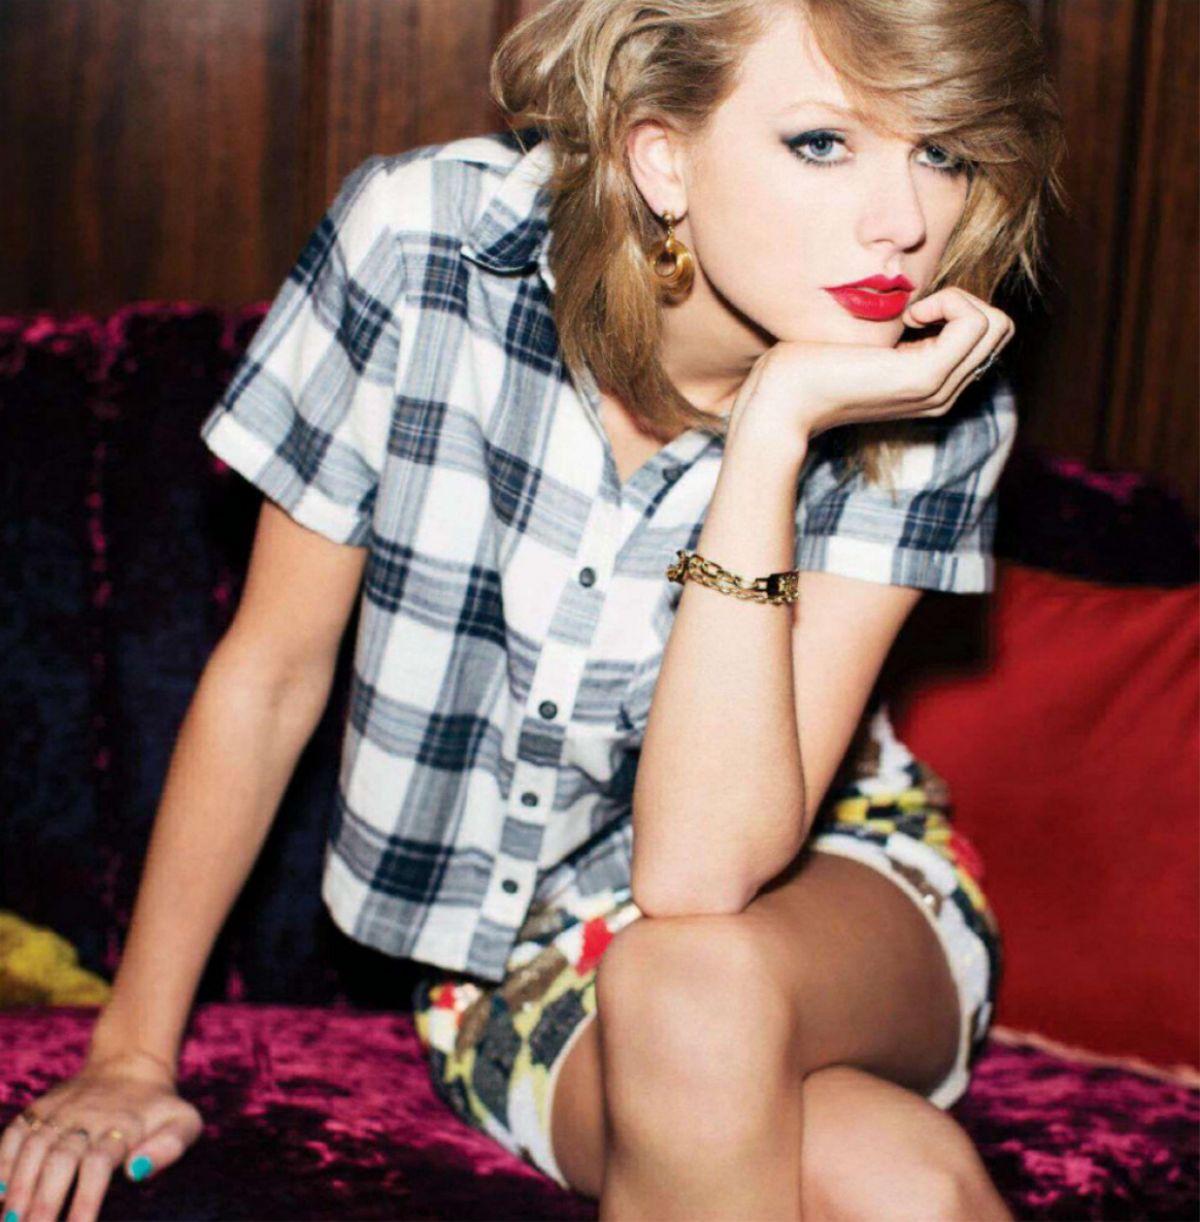 TAYLOR SWIFT in Billboard Magazine, November 2014 Issue